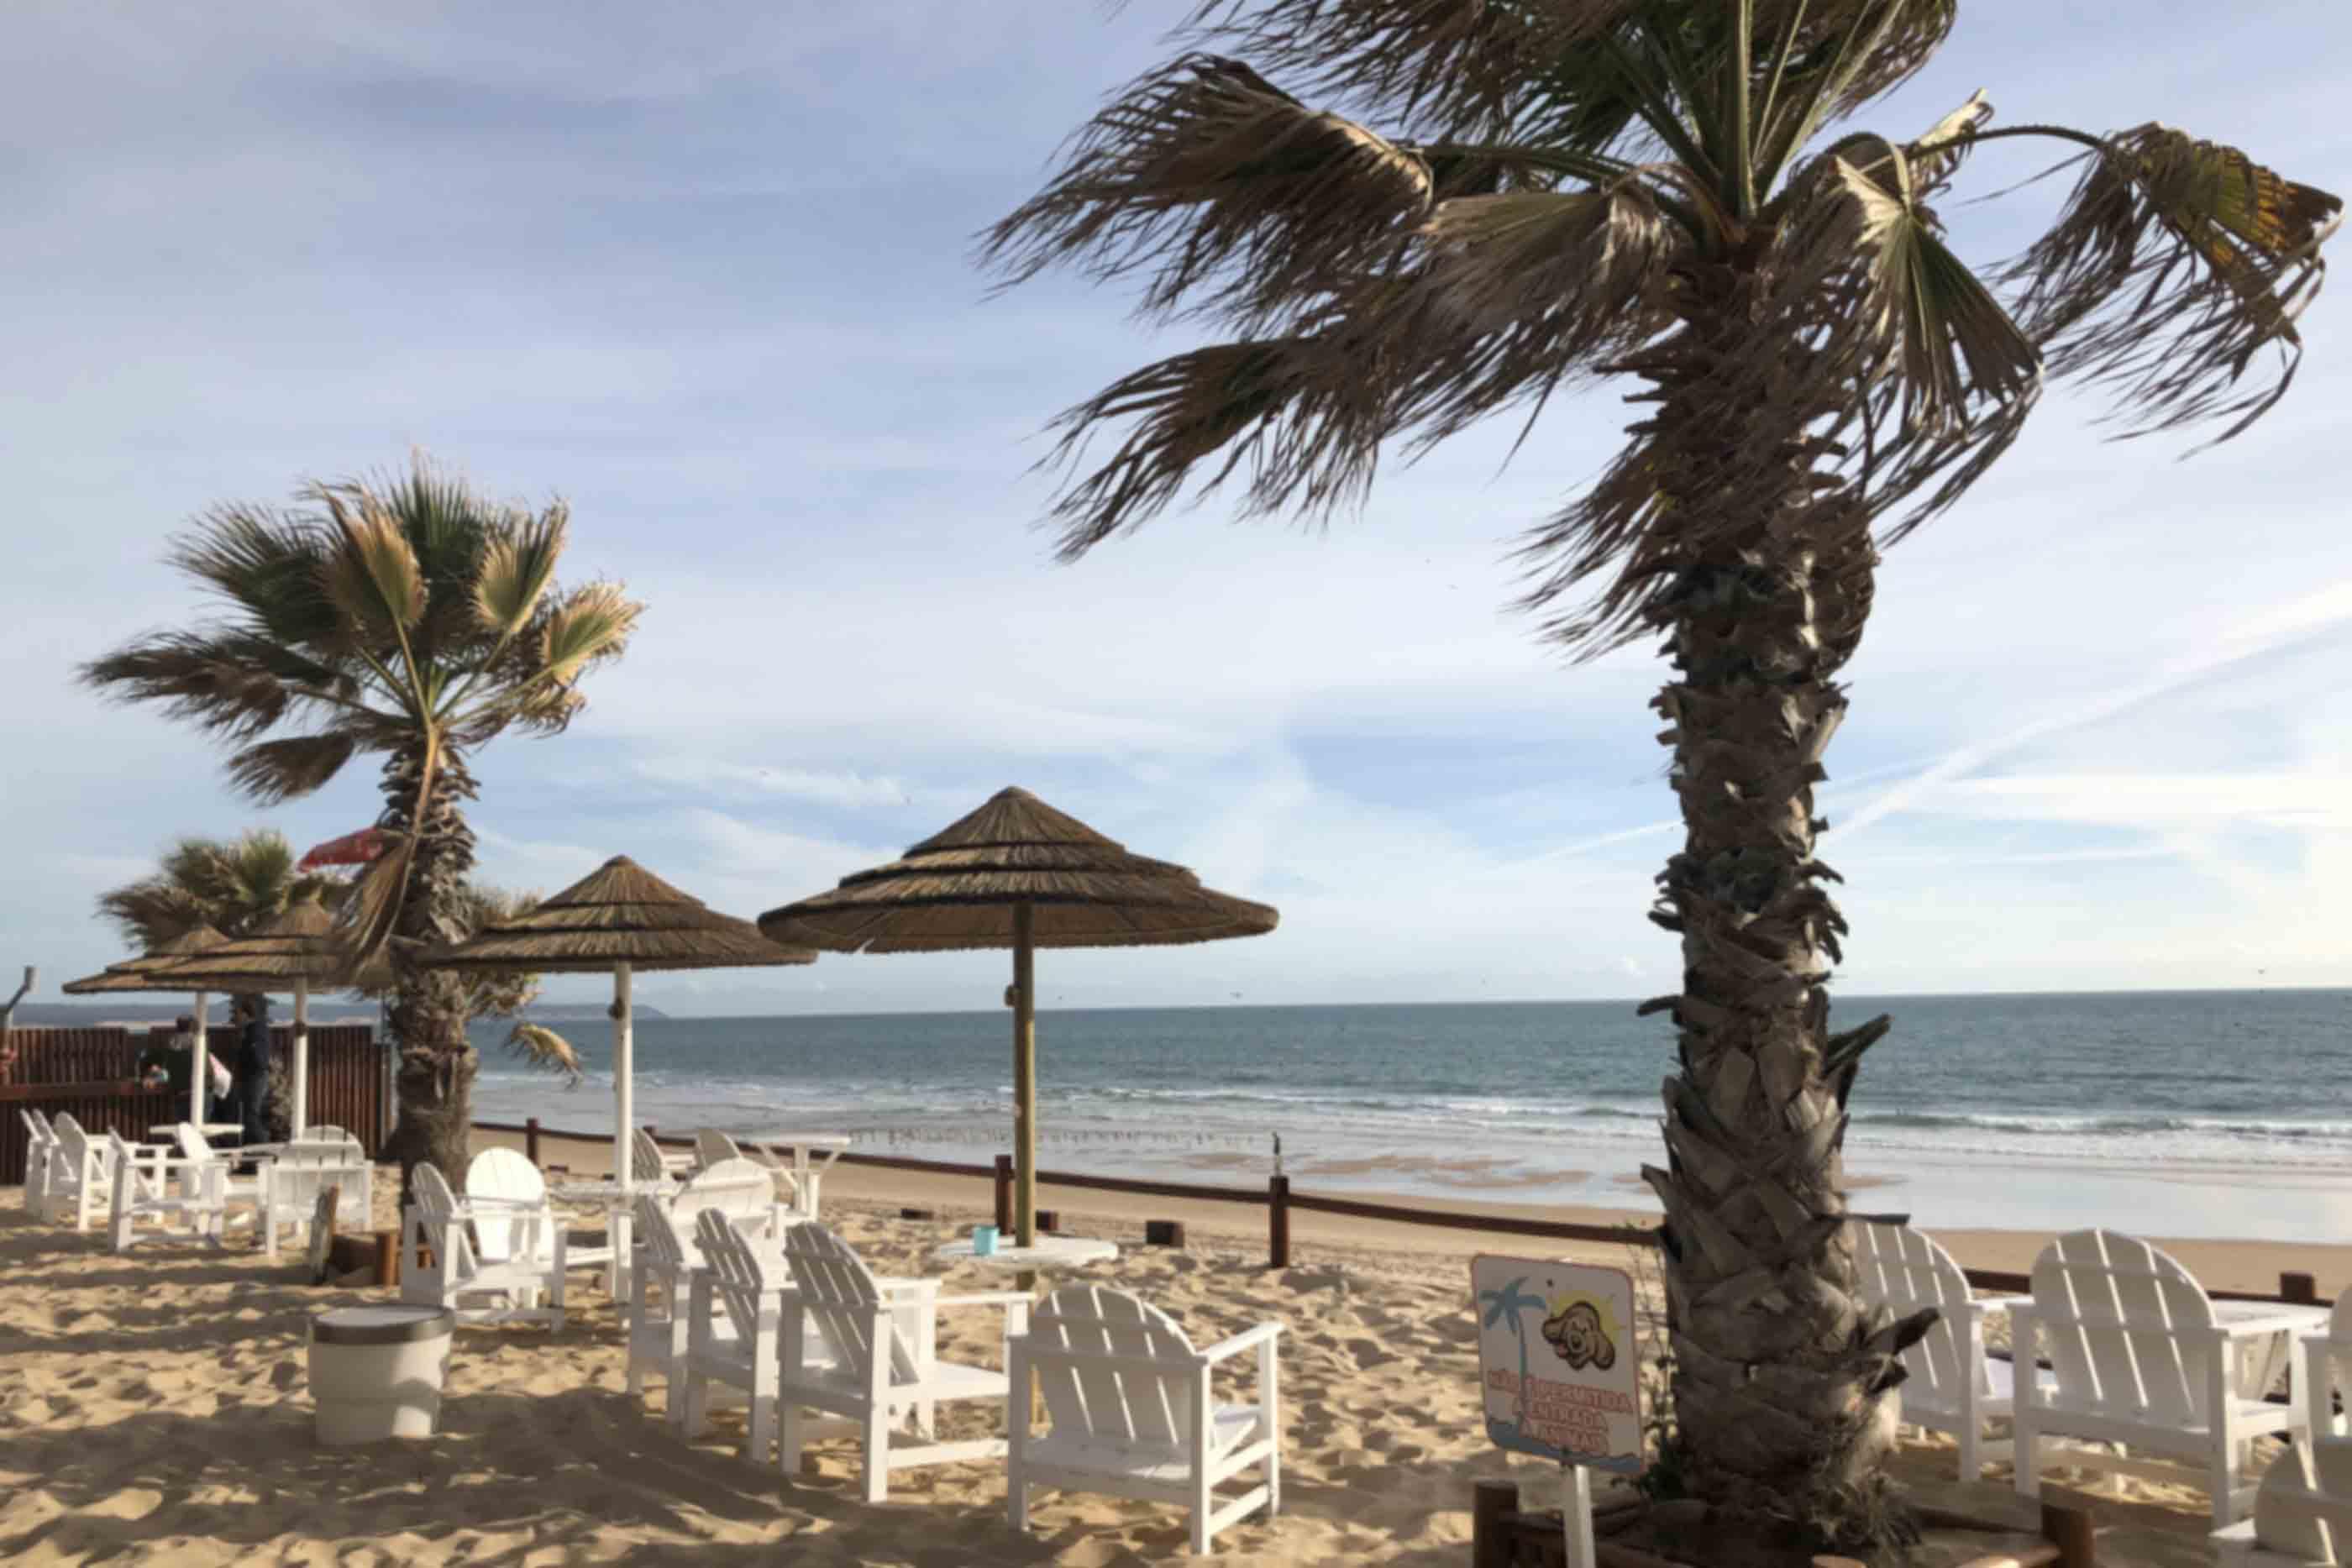 Esplanada na praia Fonte da telha, no café-bar Rampa Beach na Costa da Caparica